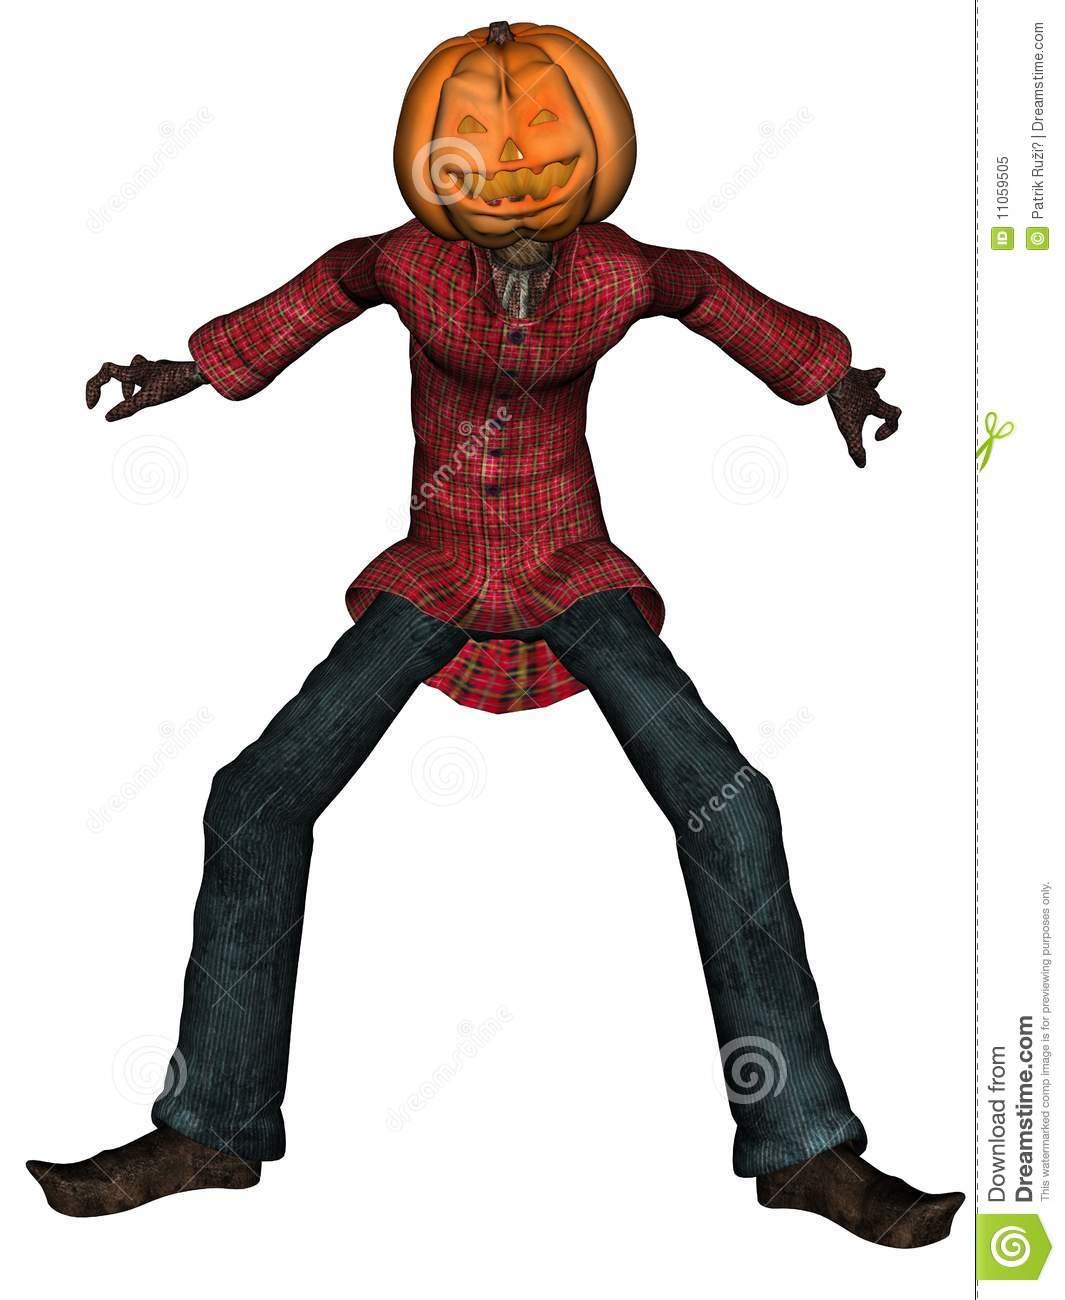 Halloween Man With Pumpkin Head Royalty Free Stock Photo.